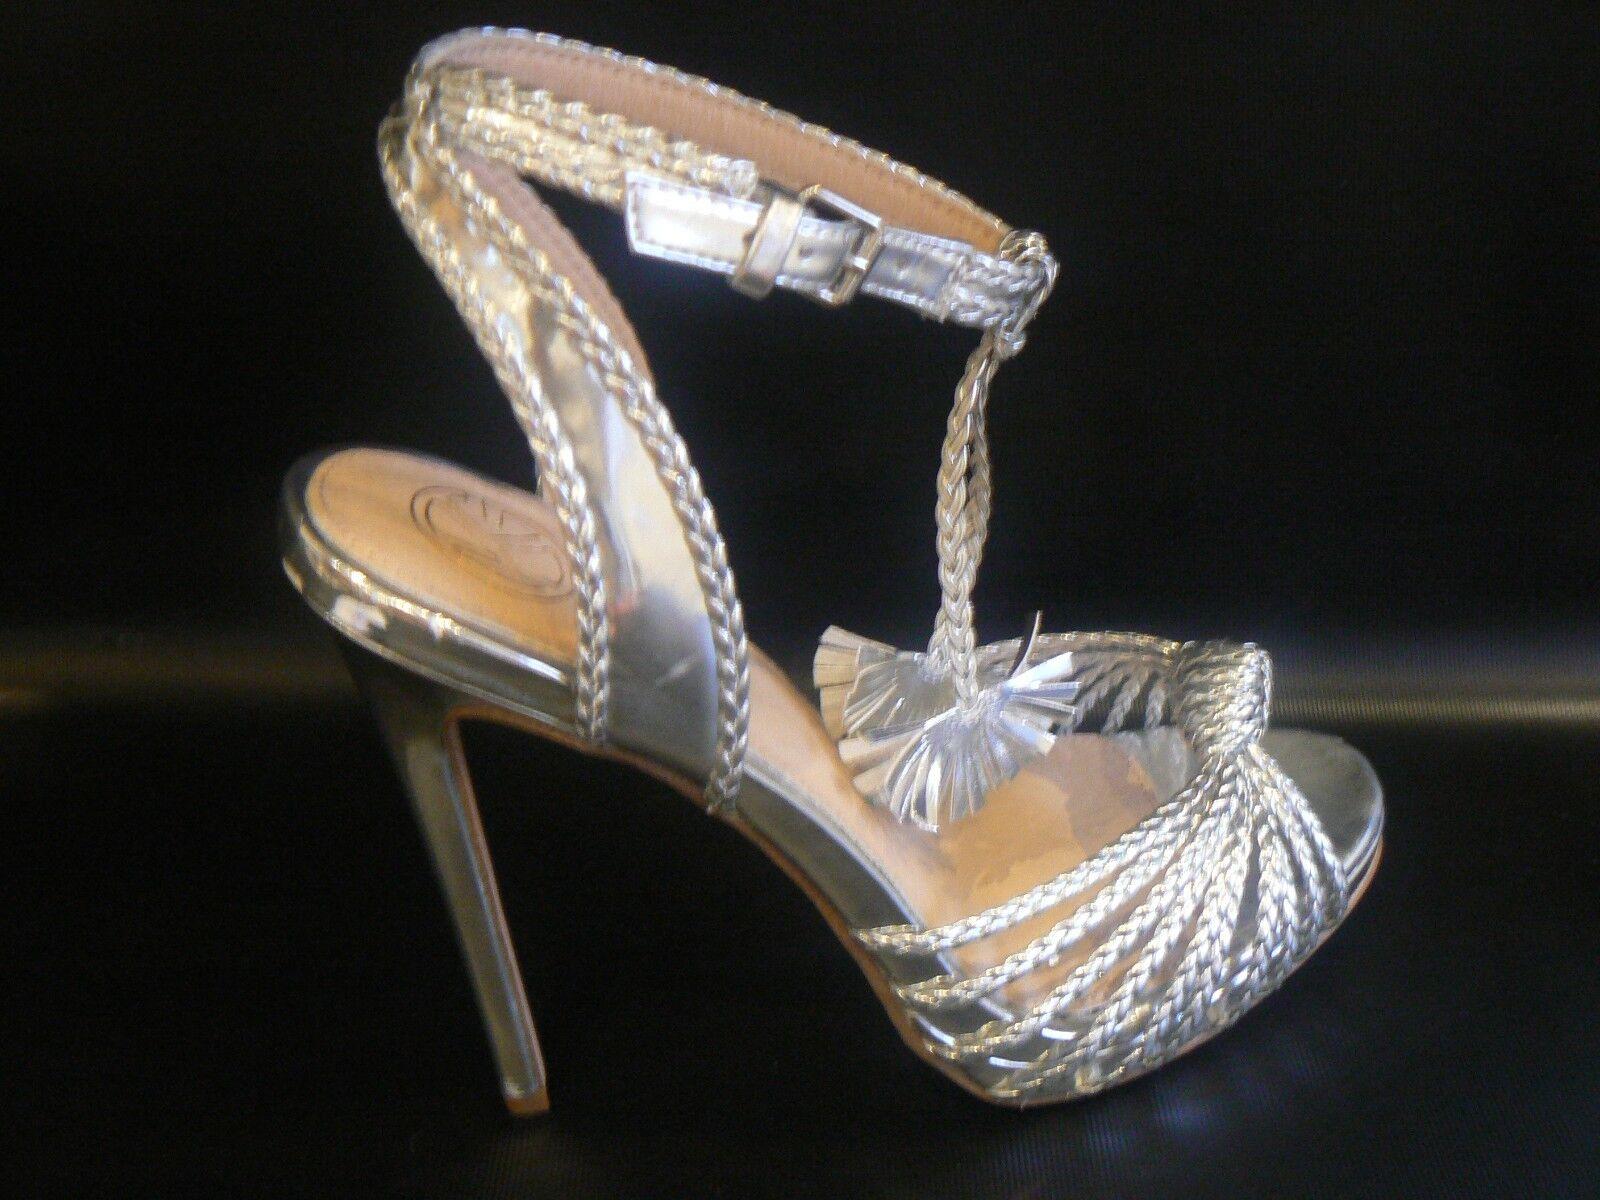 KG Kurt Geiger Hoax Silver High Heel Sandale in Silver UK Größe 8 /41